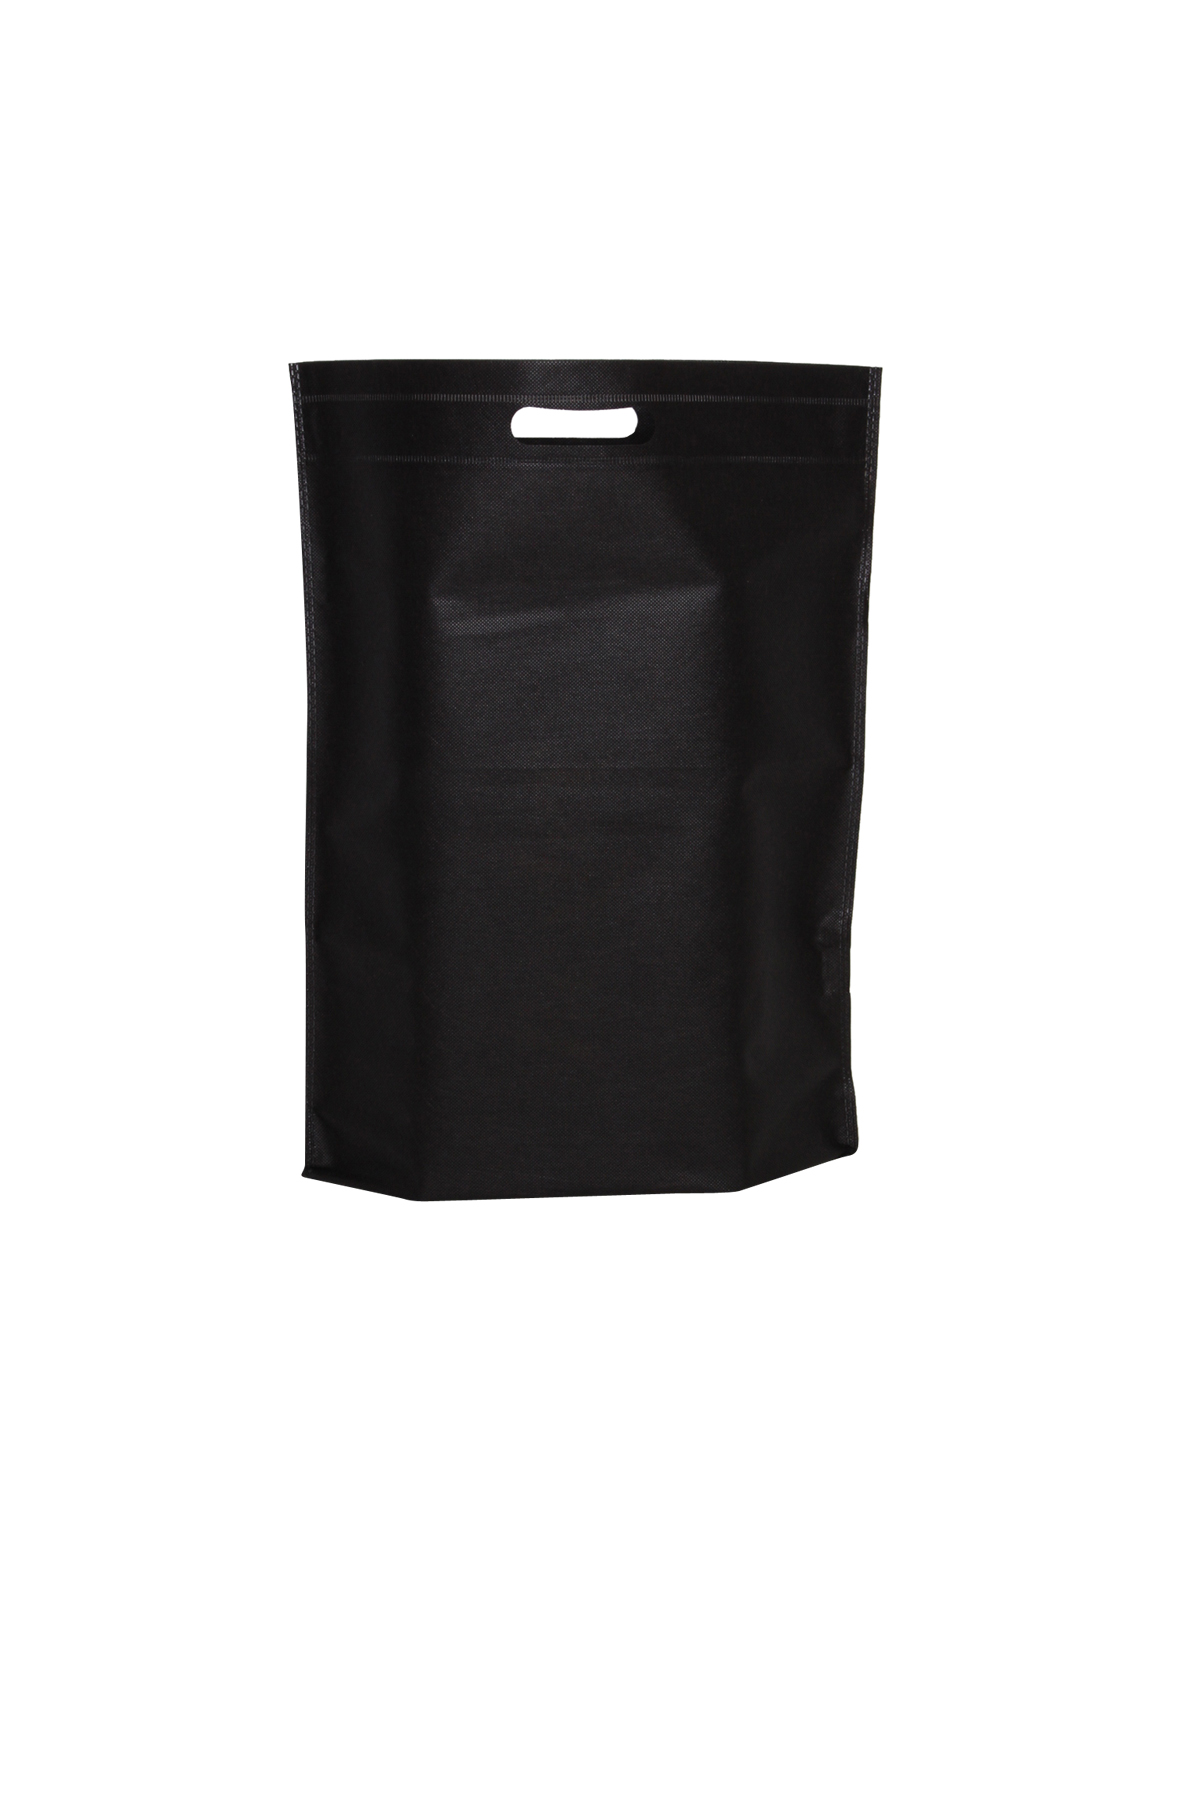 Cabas Maroquinerie Poignées-50x45x10-NOIR BAG 58